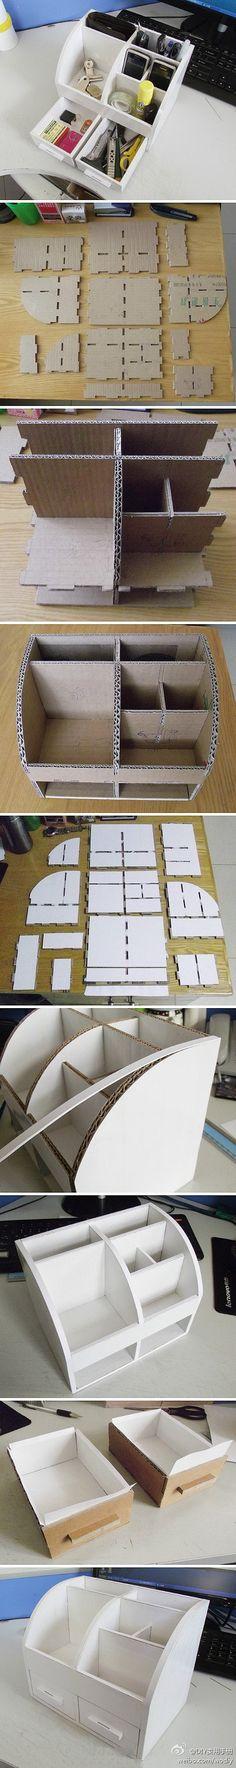 Cardboard stuff organizer DIY